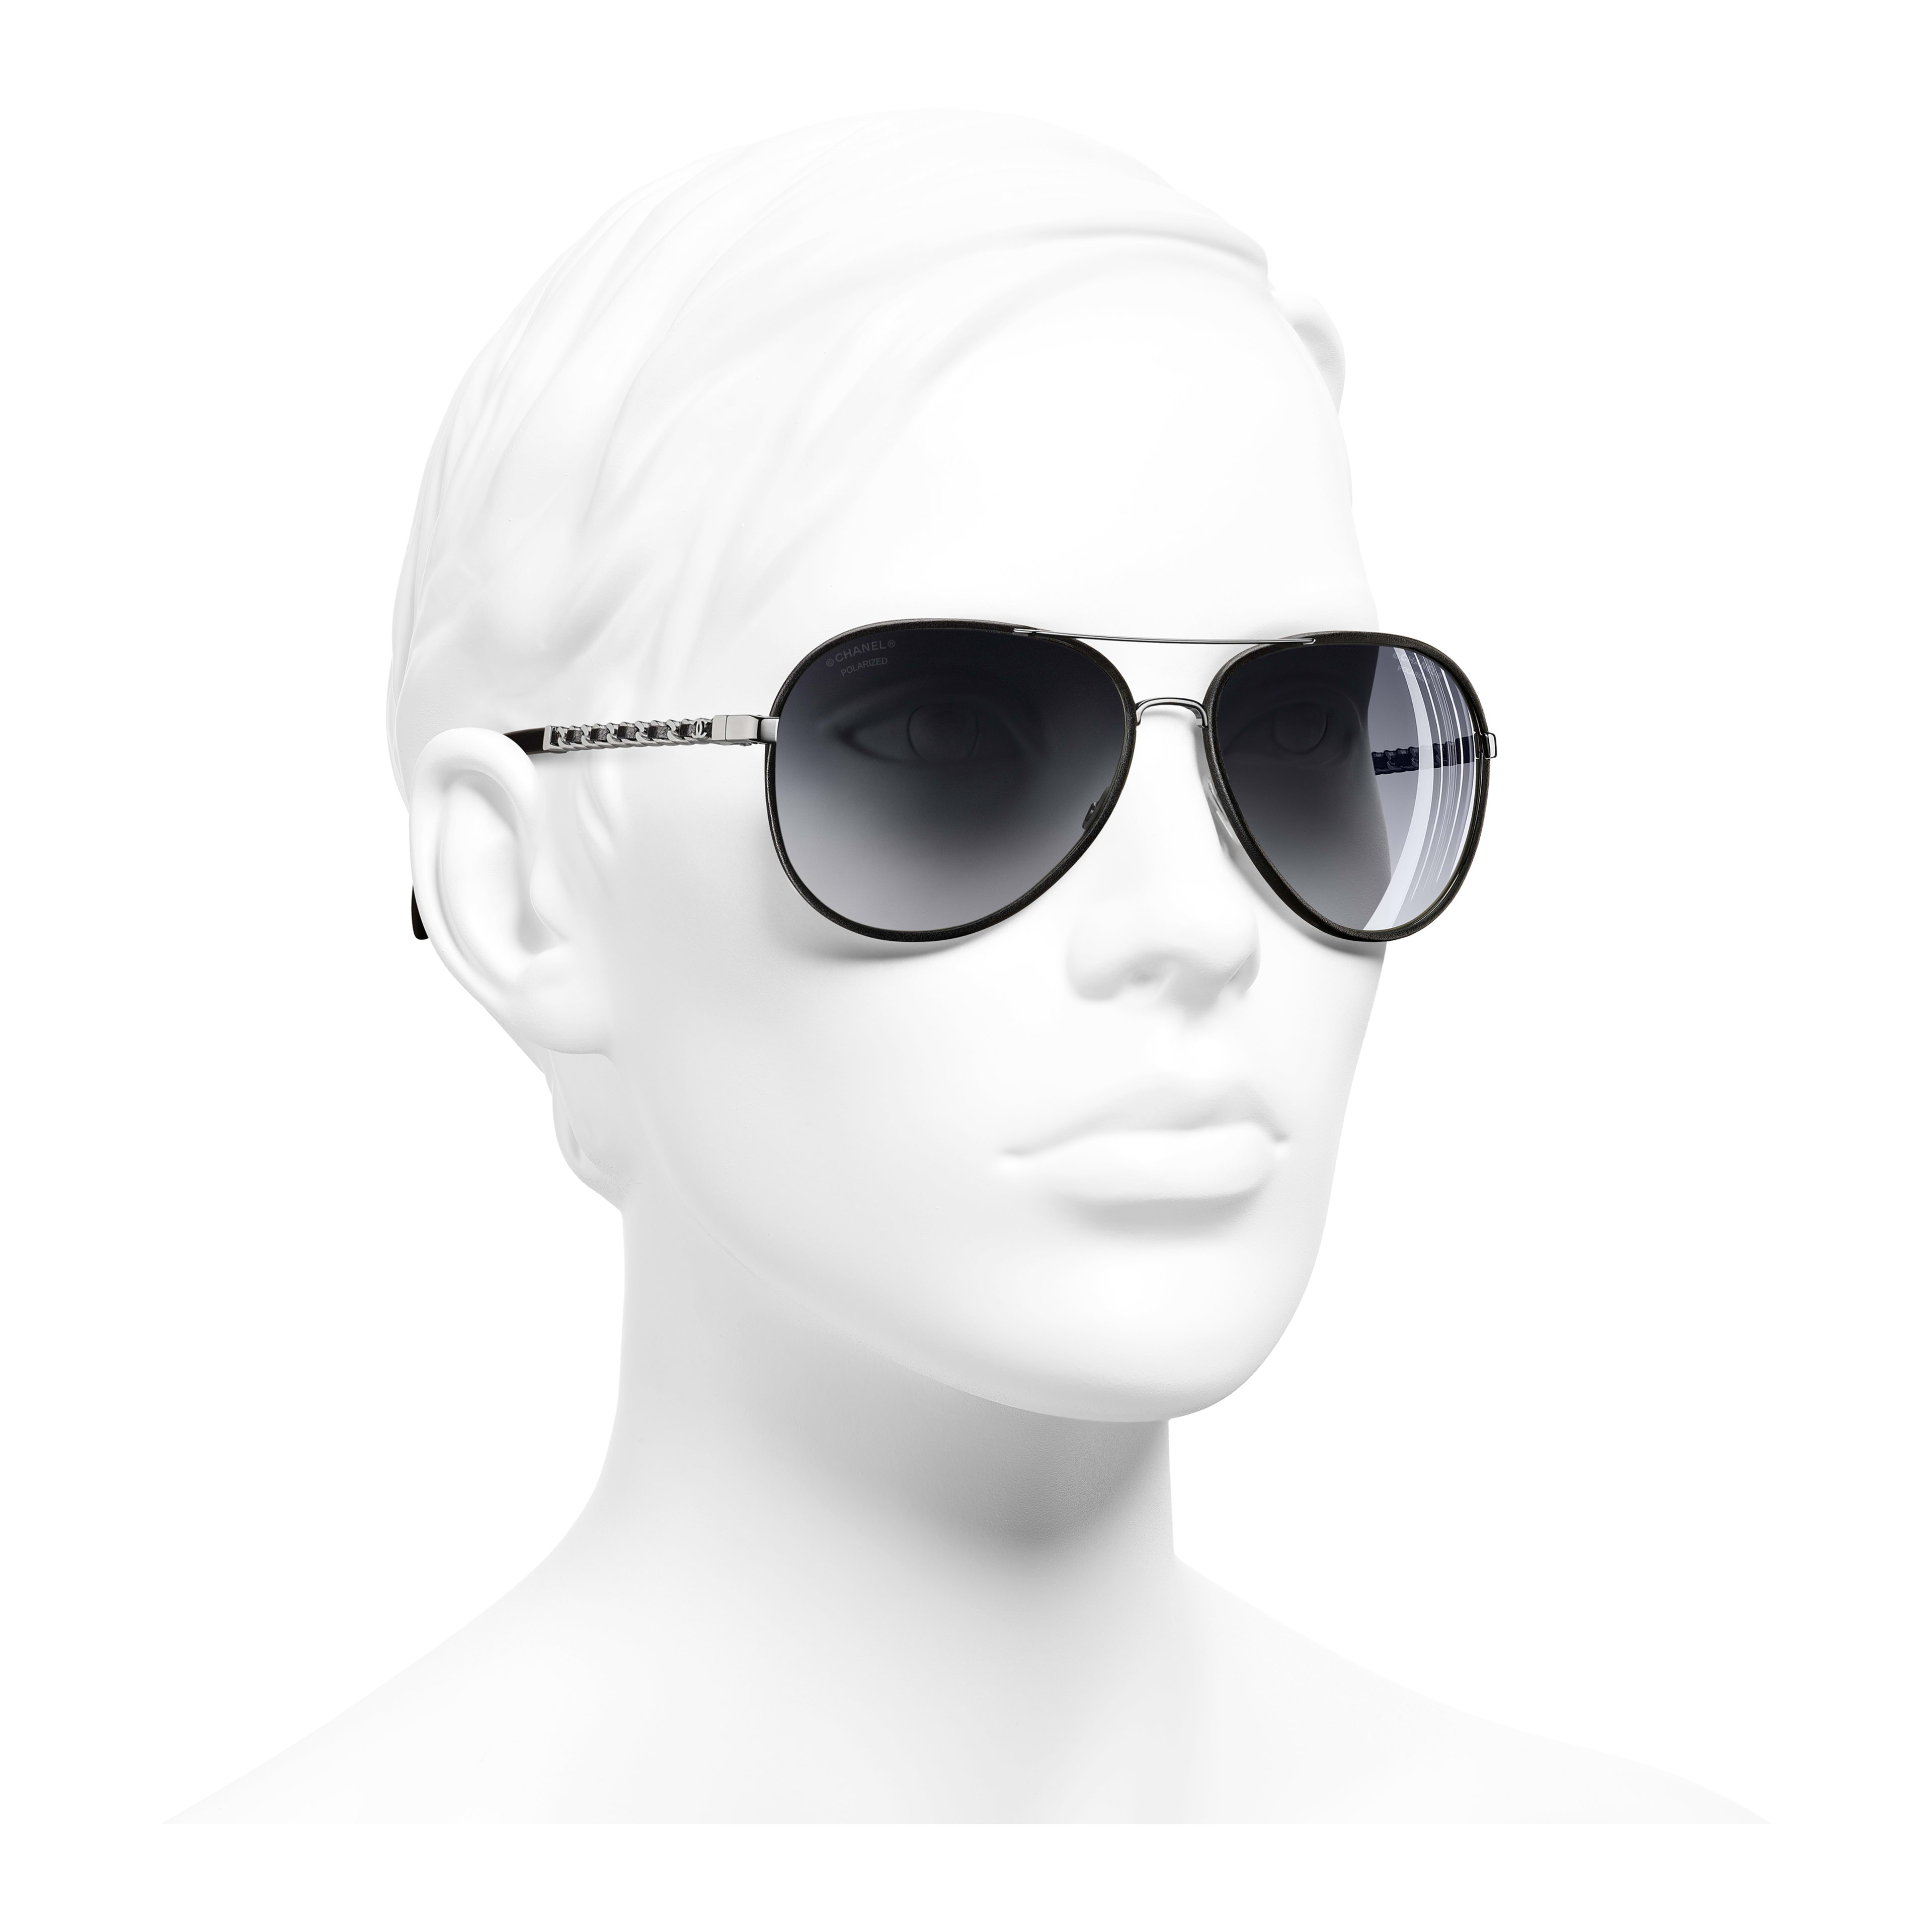 Pilot Sunglasses - Black - Metal & Calfskin - Polarized Lenses - Worn 3/4 view - see full sized version